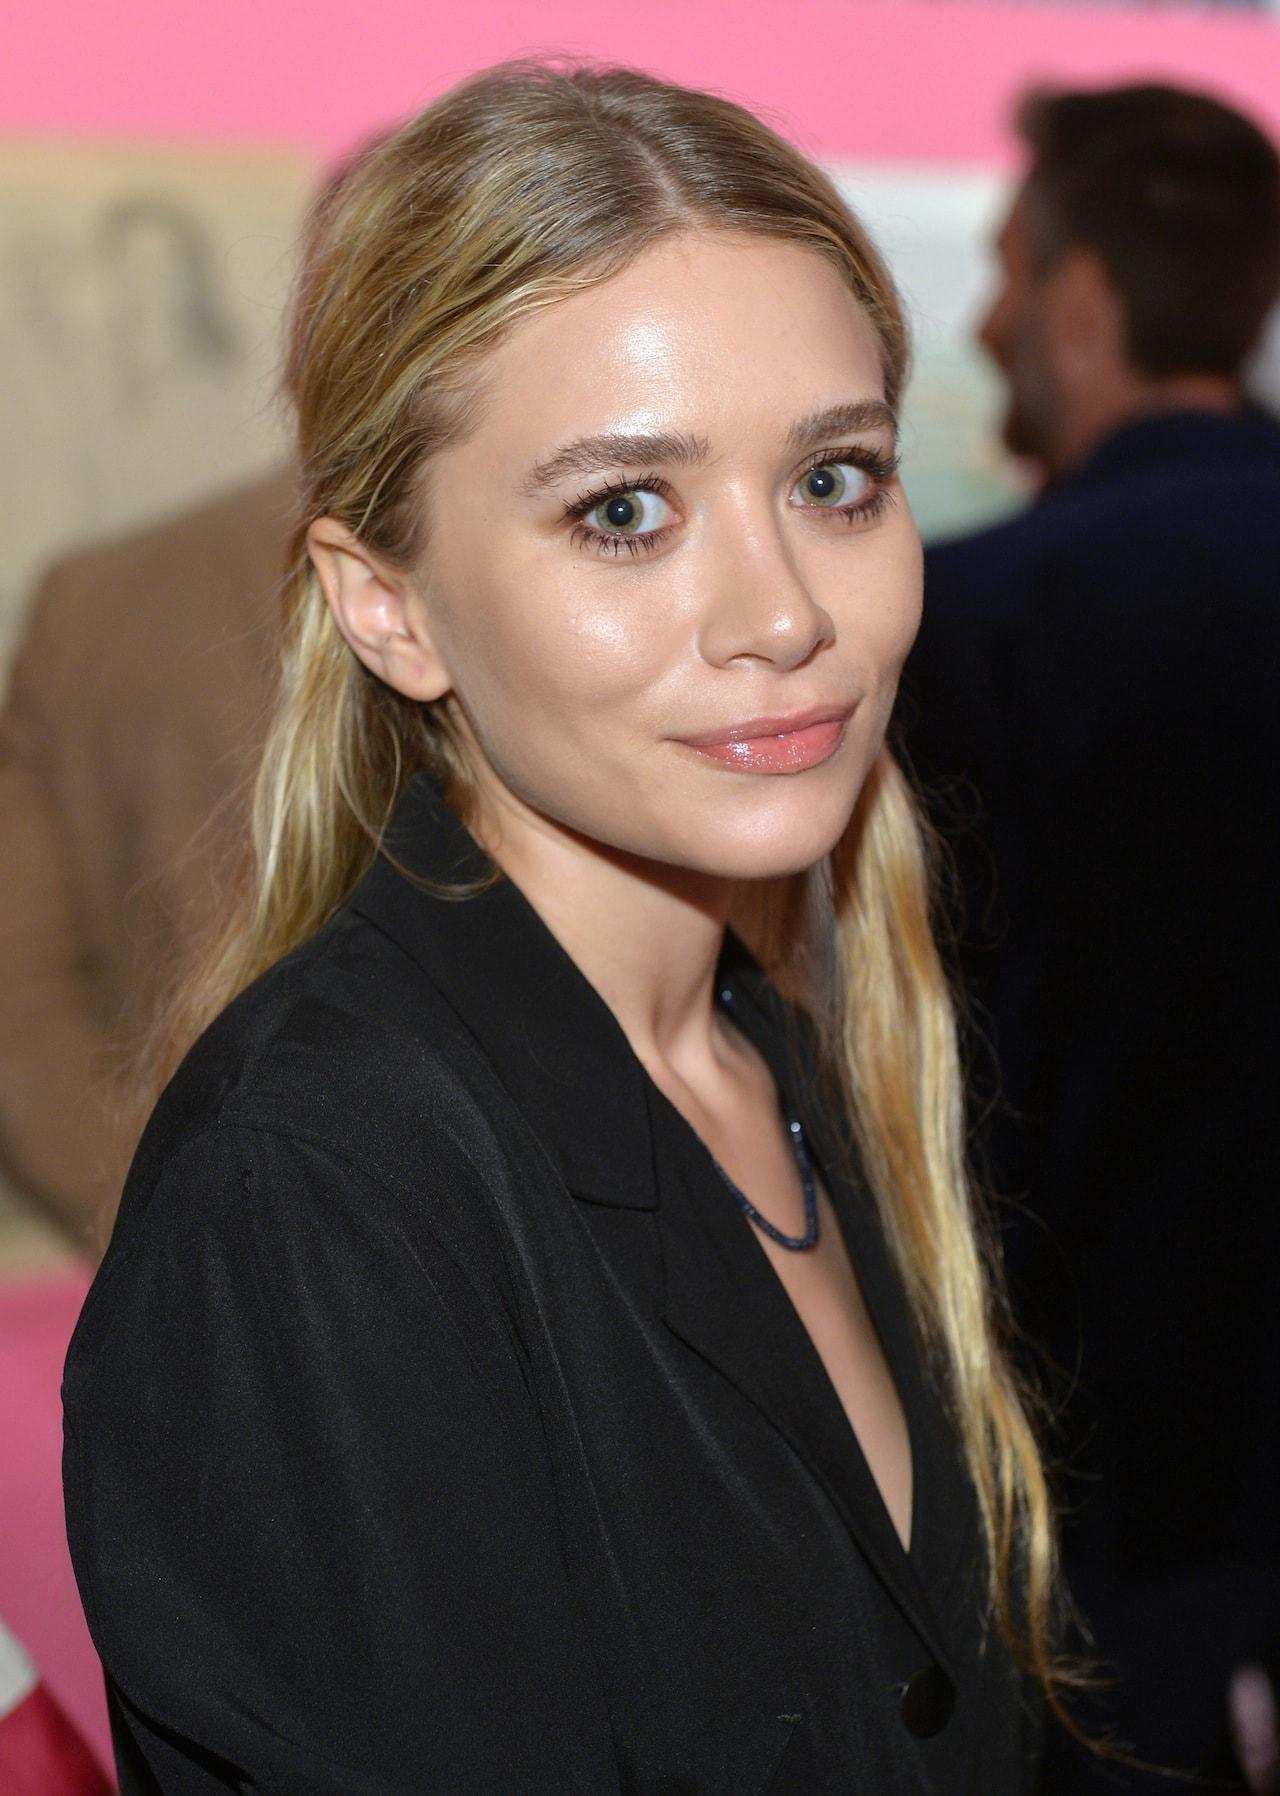 Ashley Olsen Wallpapers hd